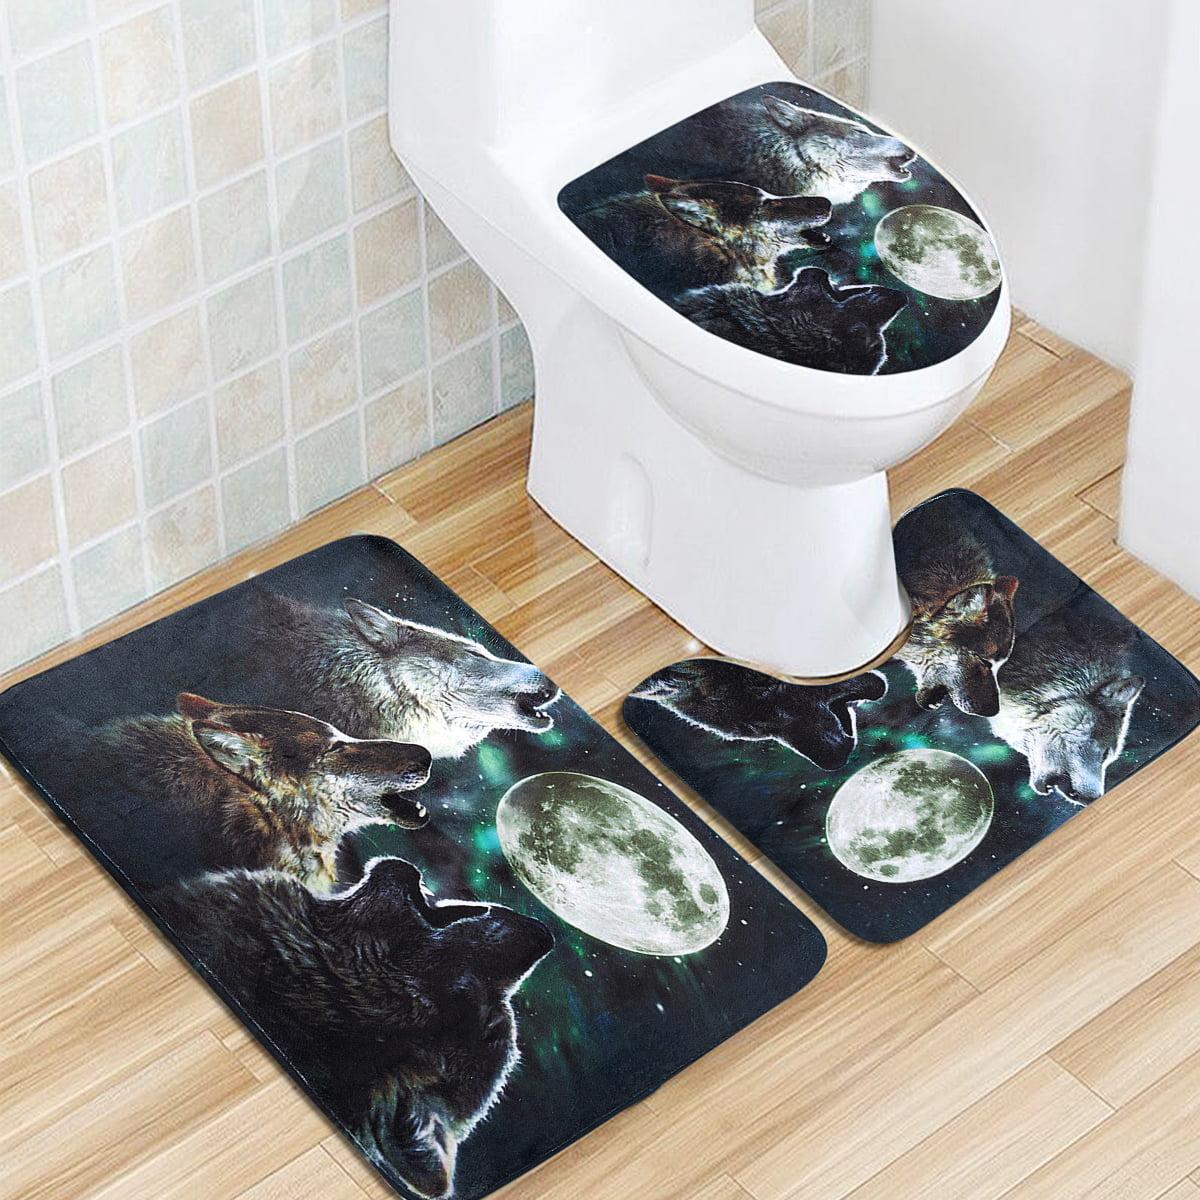 Moon Wolf Shower Curtain Bath Mat Toilet Cover Rug Bathroom Decor Set